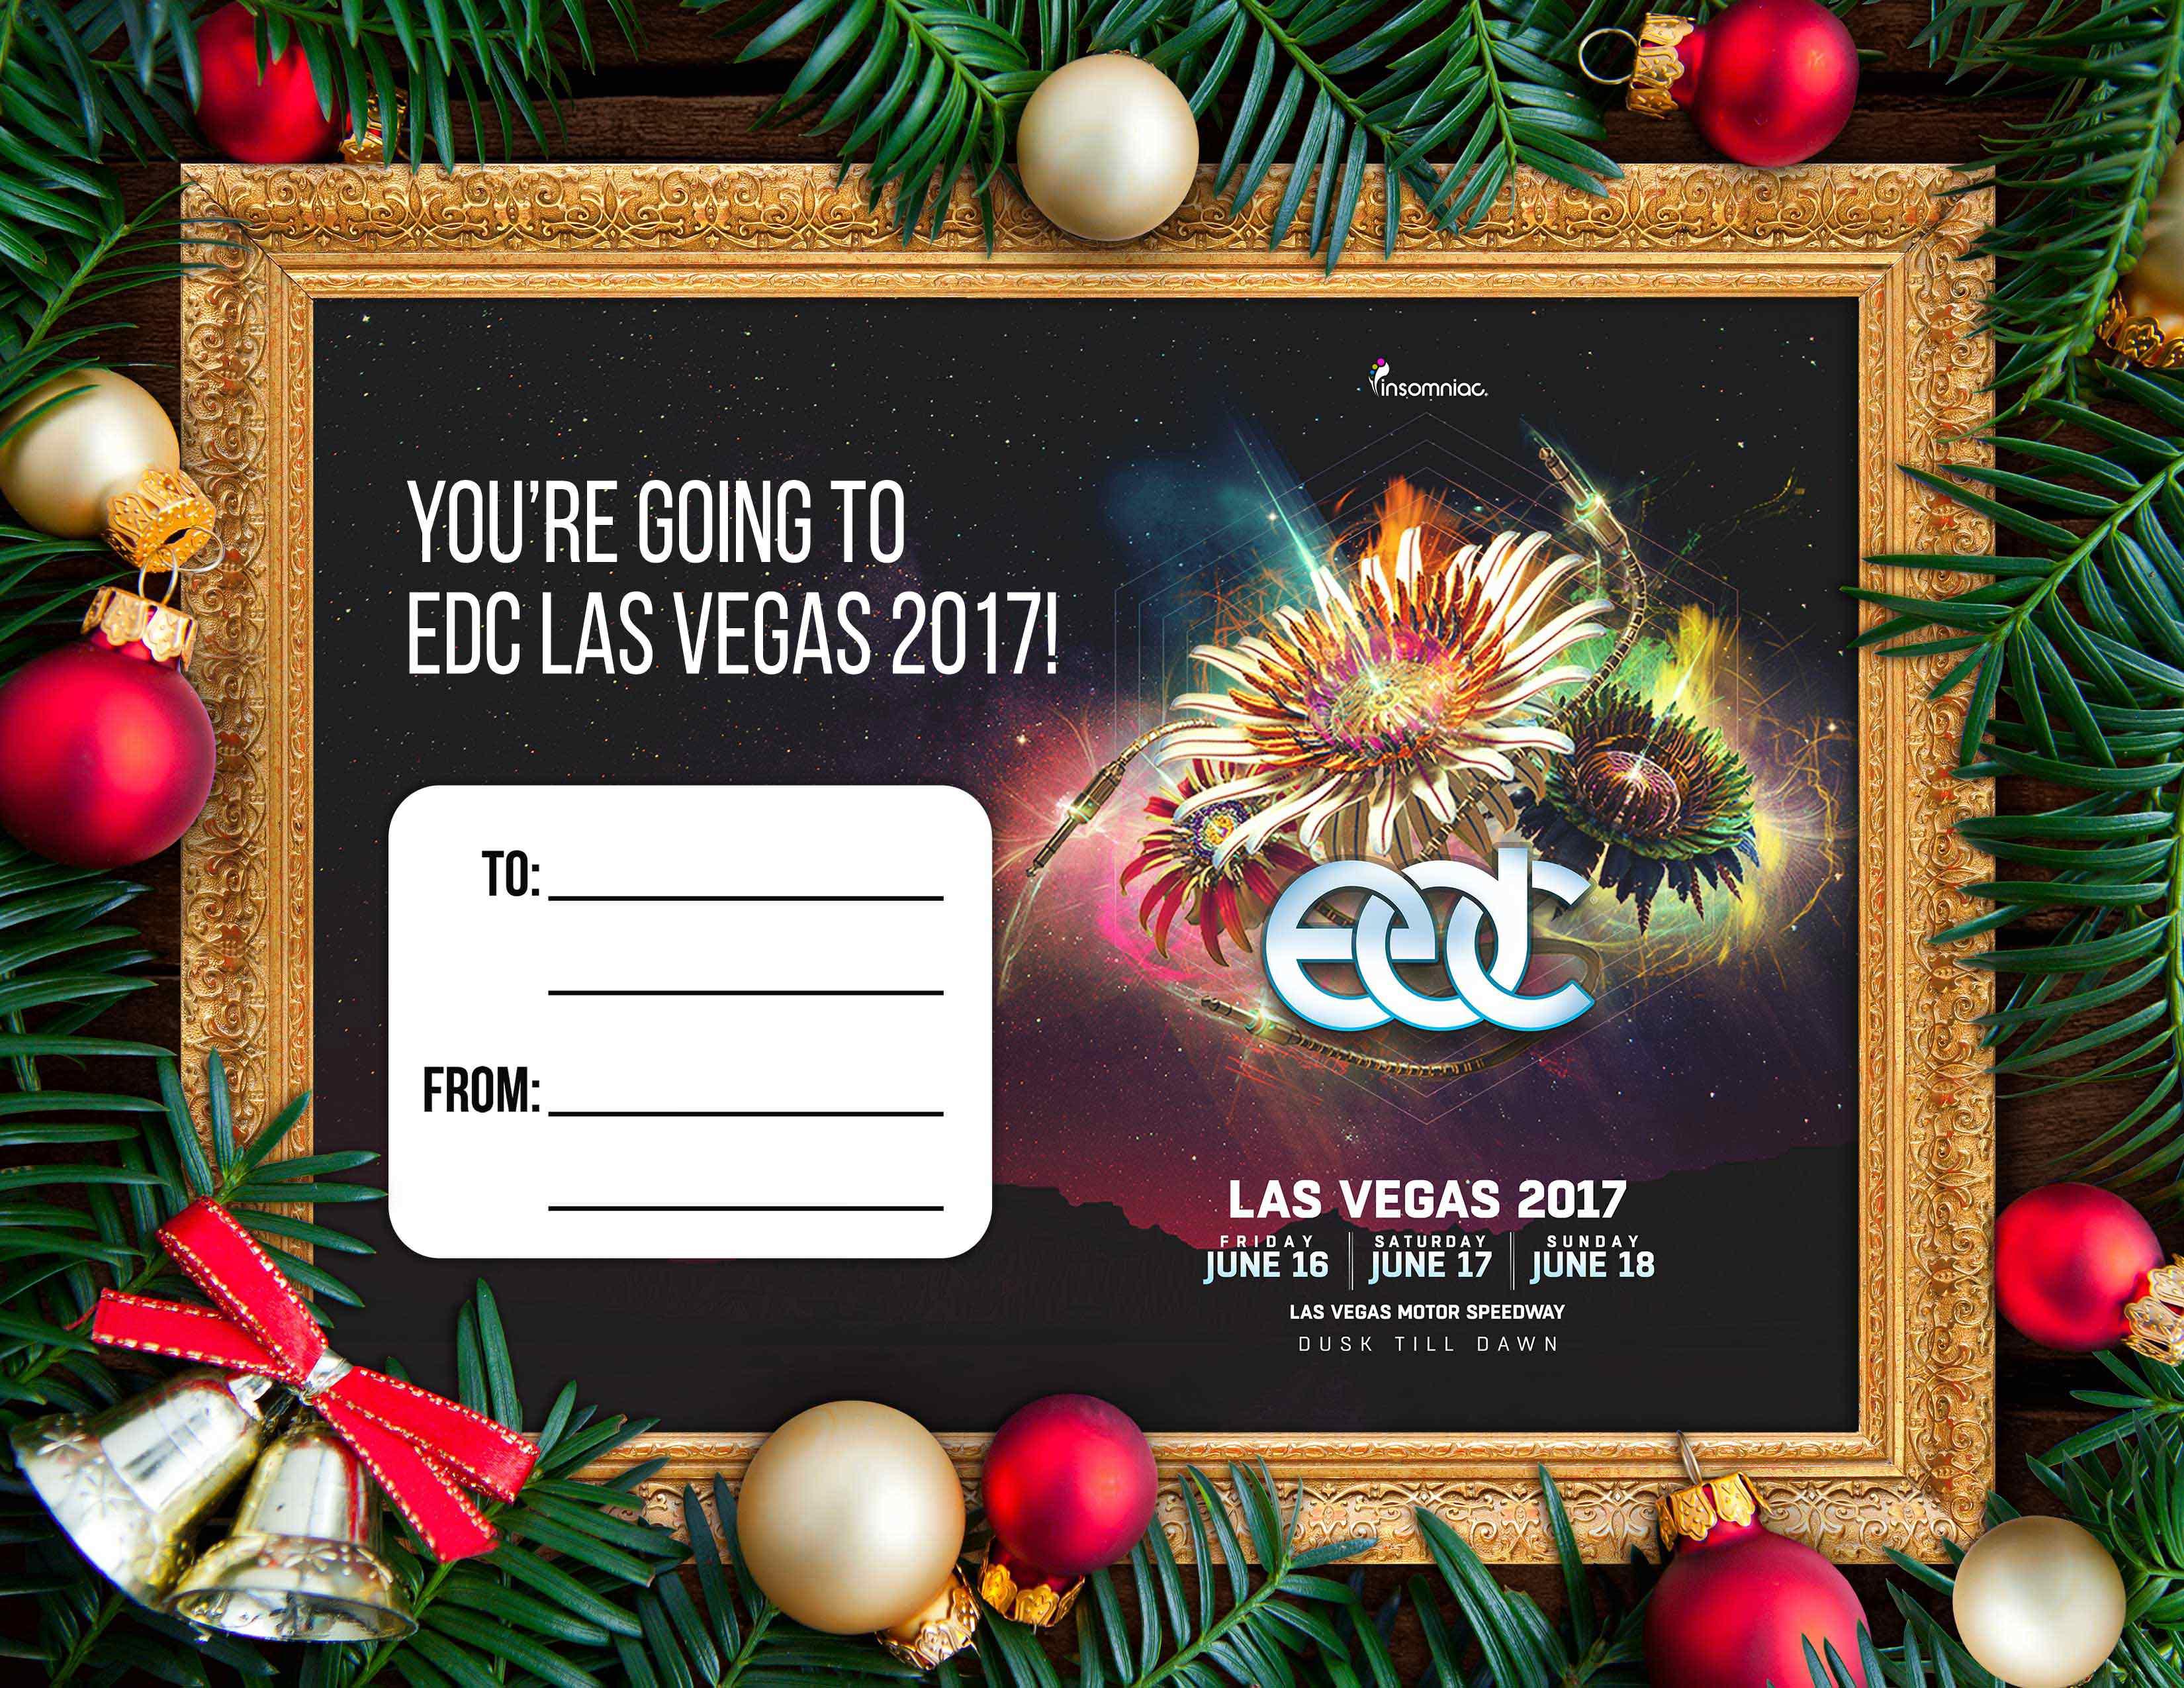 edc_las_vegas_holiday_show_certificate_8.5x11_r01_v1_WEB